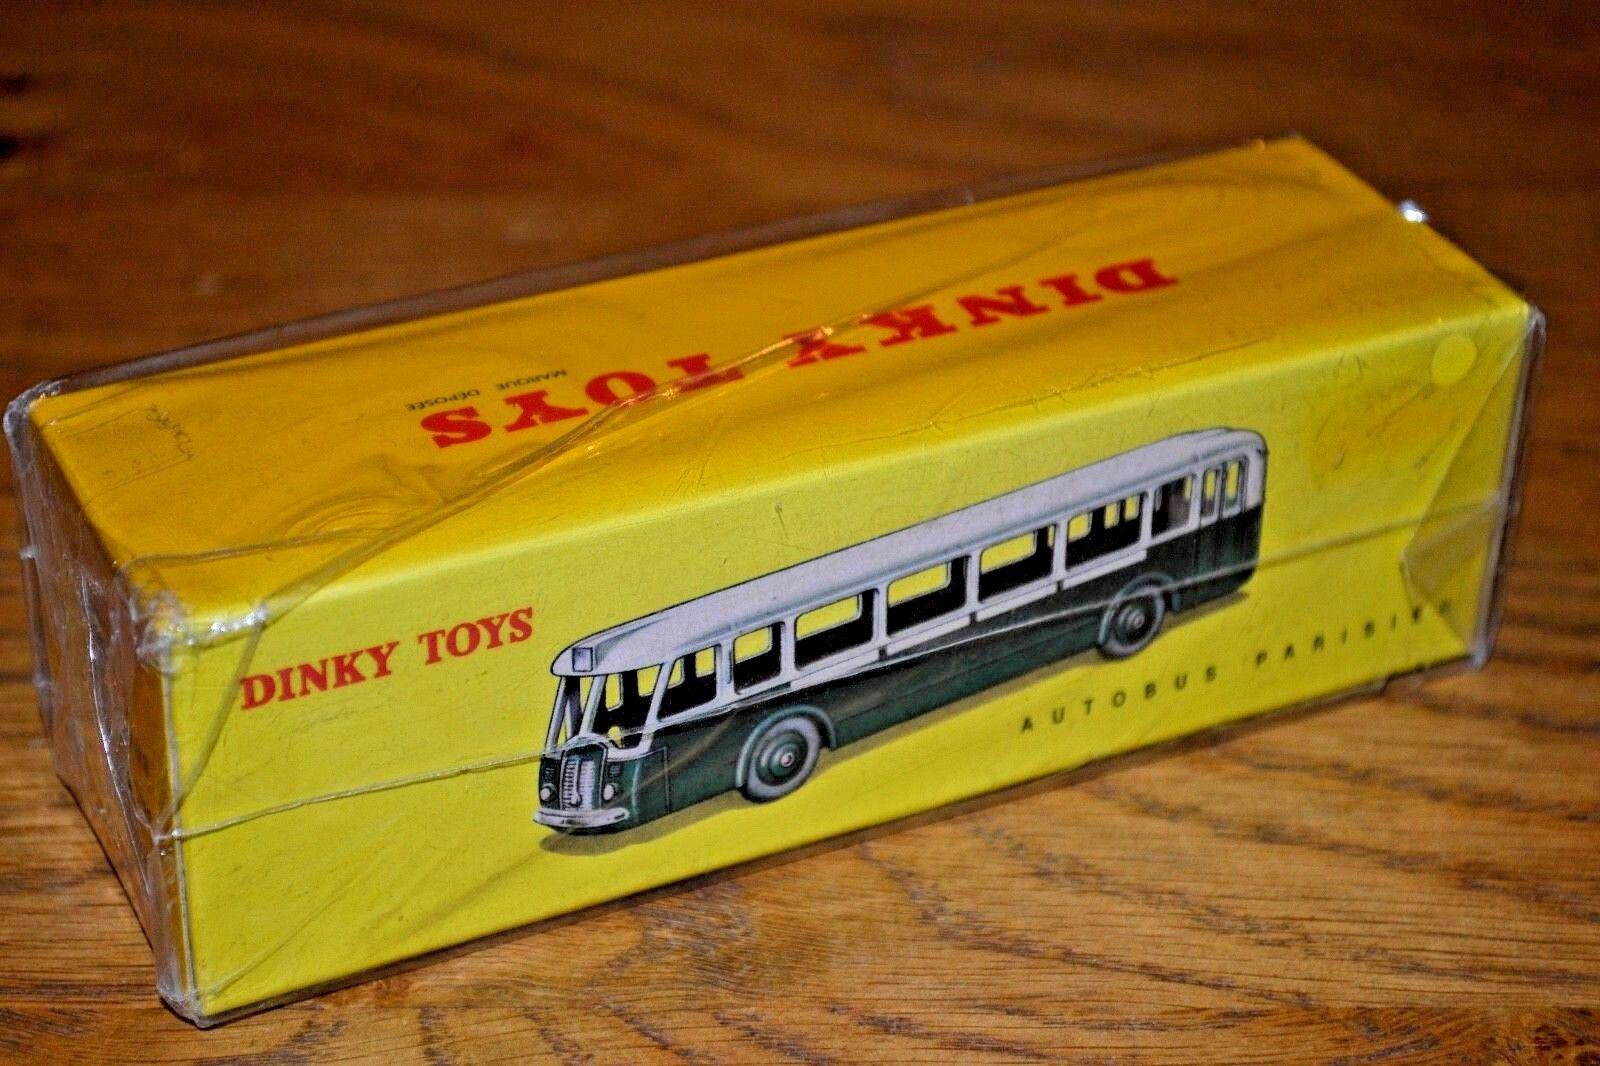 2013 French Dinky Toys Atlas Edition Diecast No. 29D Autobus Parisien